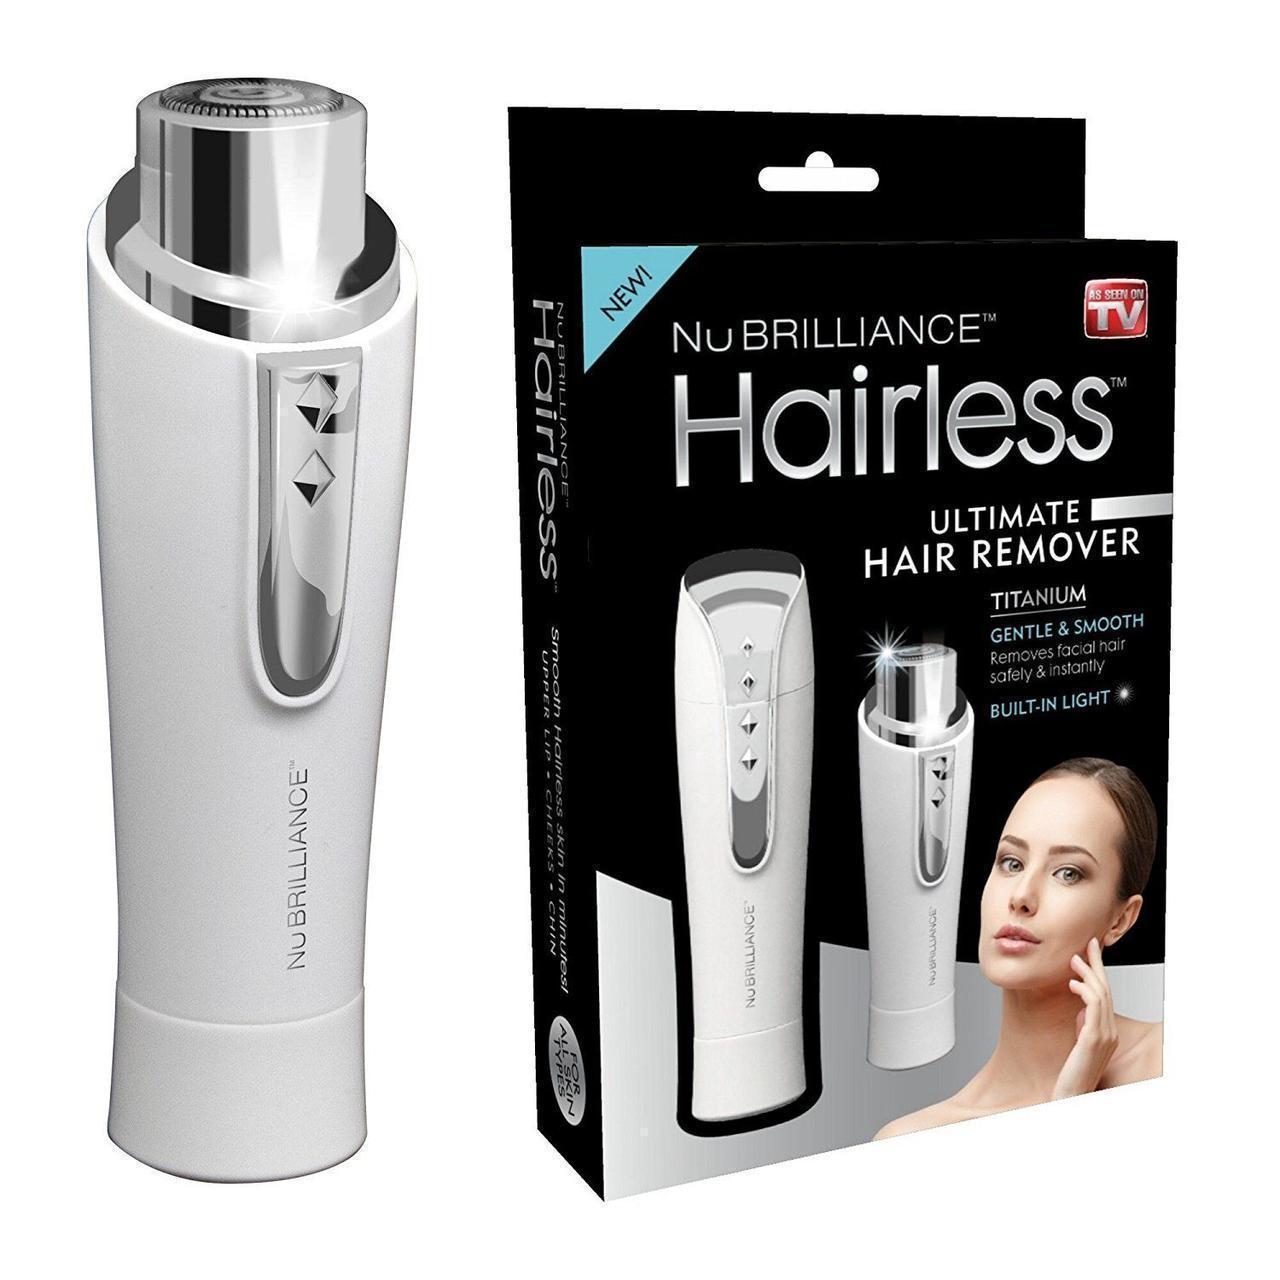 Эпилятор для лица NuBrilliance Hairless | триммер женский